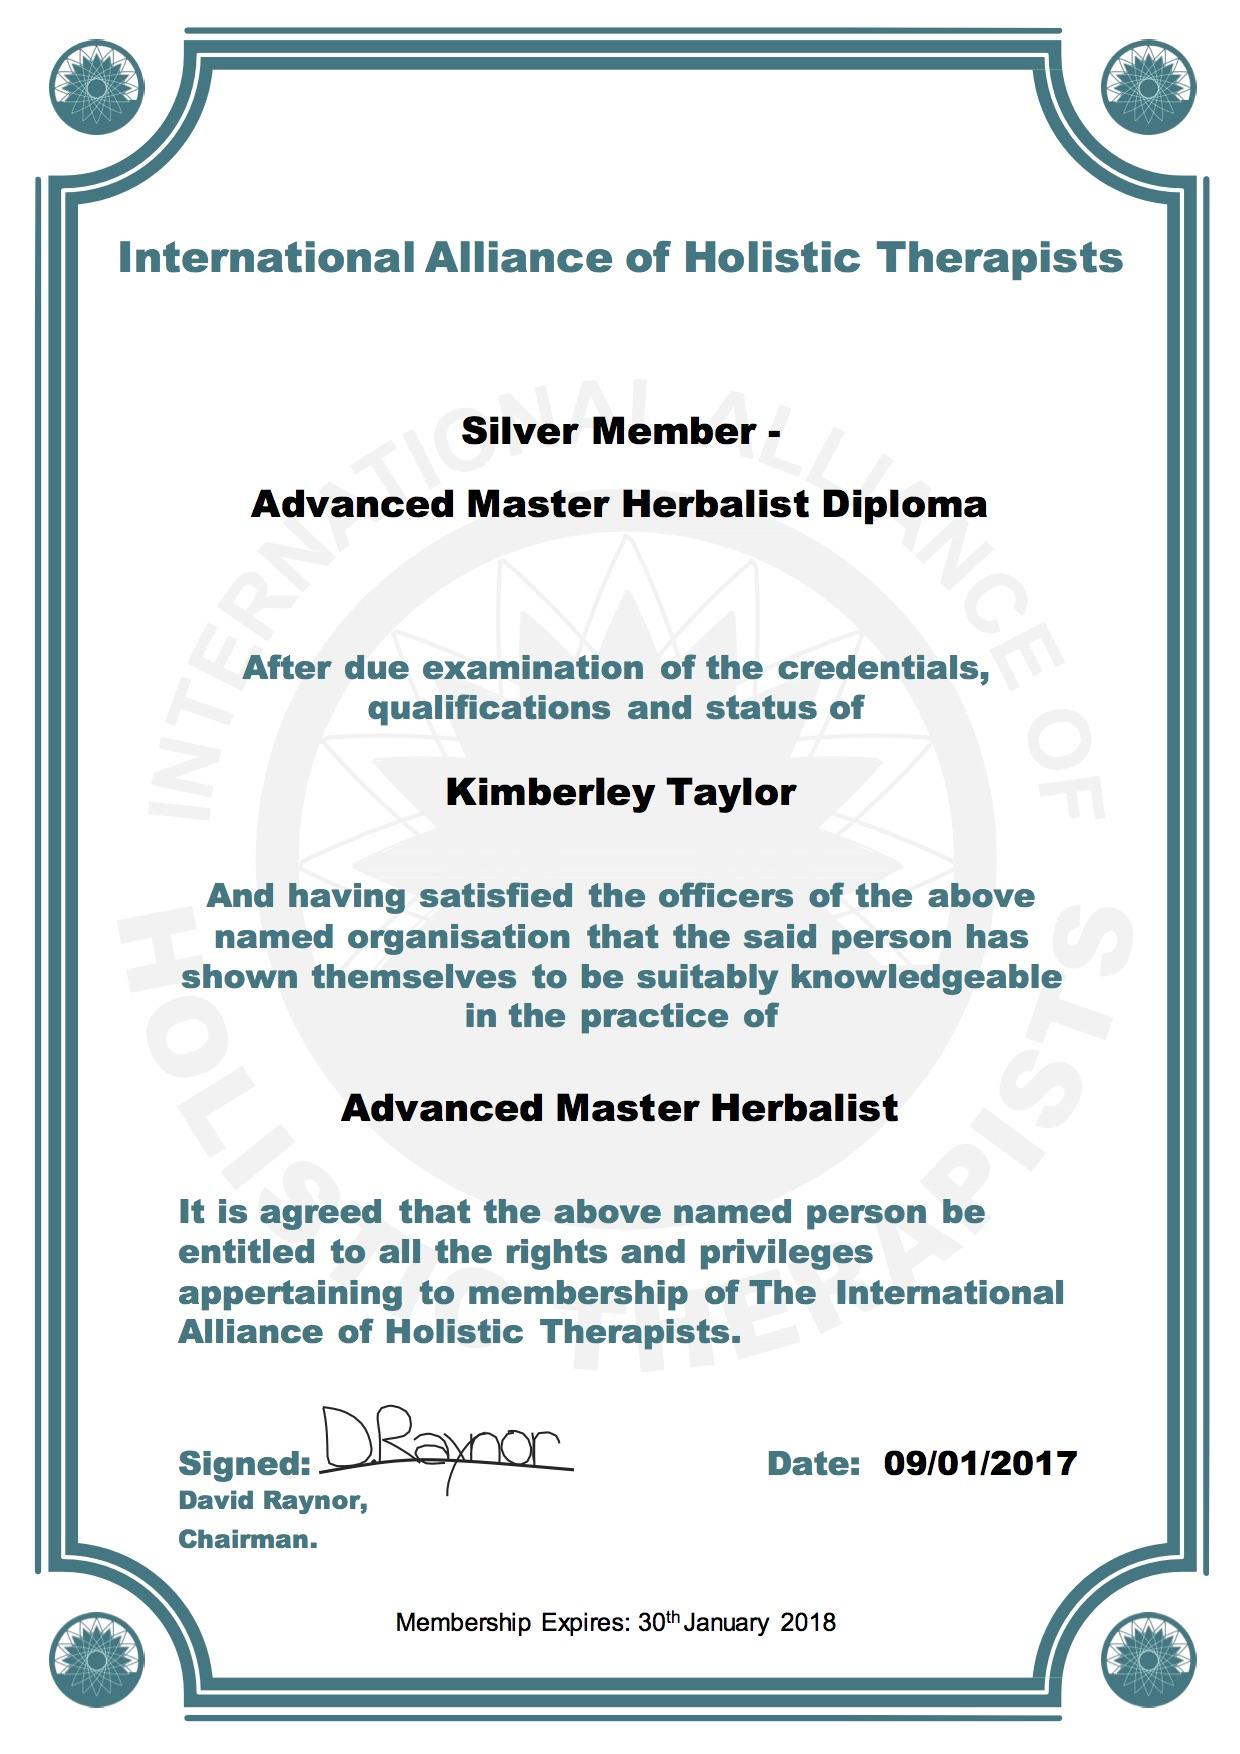 IAHT Silver Member Advanced Master Herbalist Diploma Kimberley Taylor